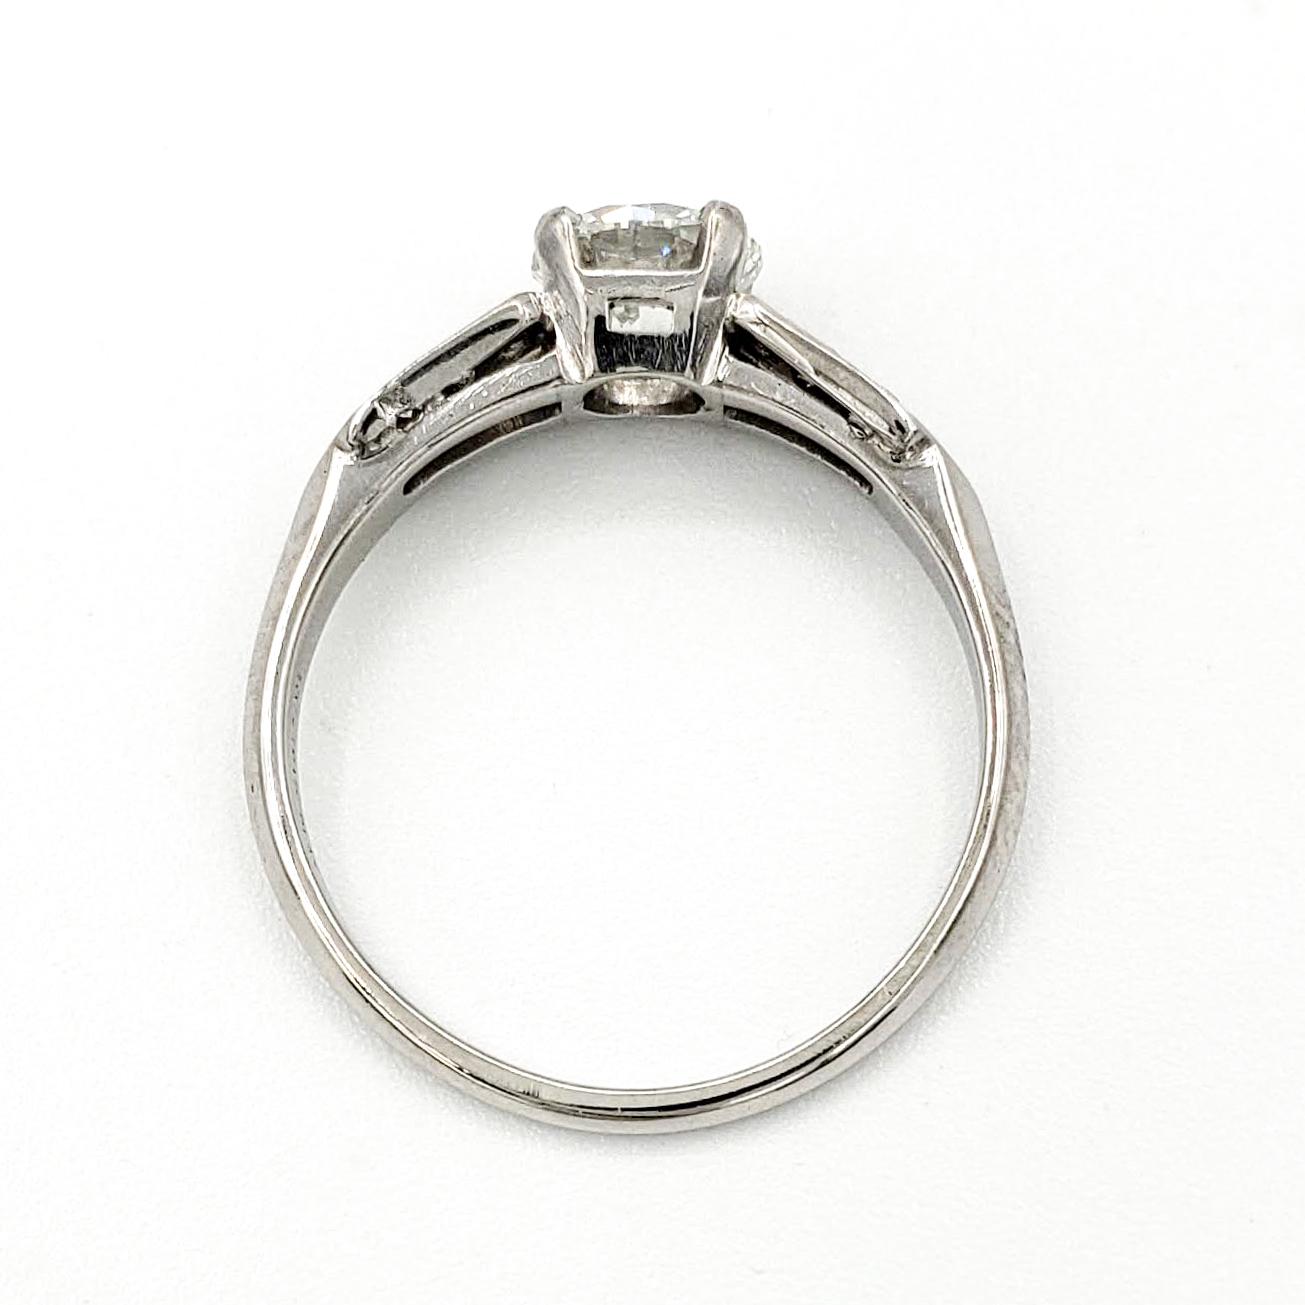 vintage-platinum-engagement-ring-with-0-70-carat-round-brilliant-cut-diamond-gia-h-vvs2